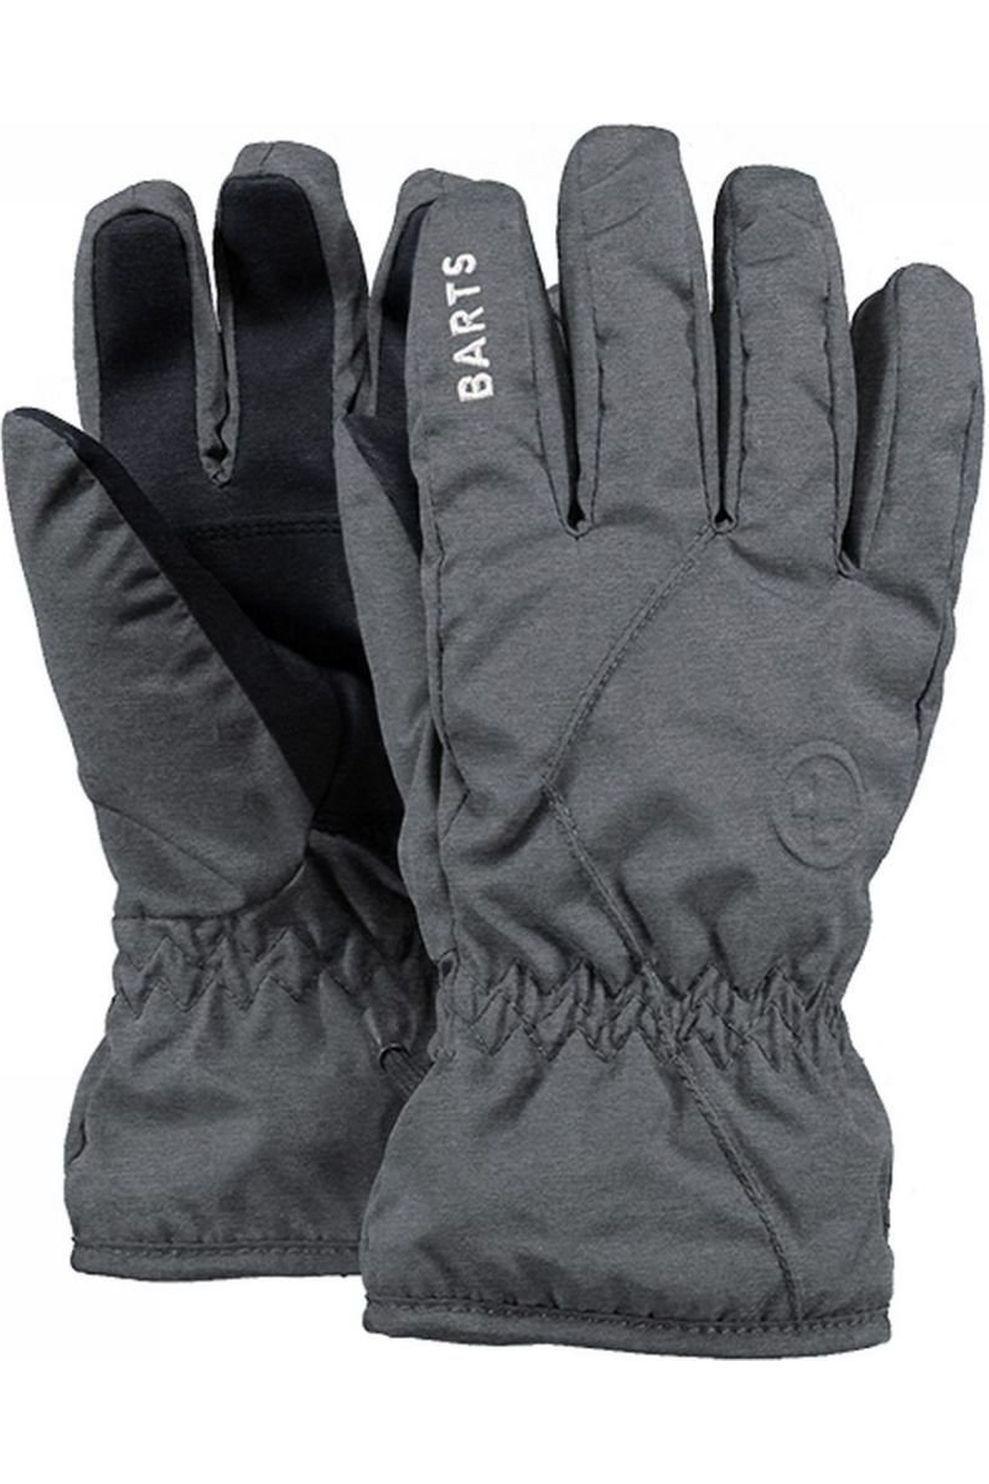 Barts Handschoen Basic Skigloves Kids - Grijs Mengeling - Maten: 4, 6, 8, 10